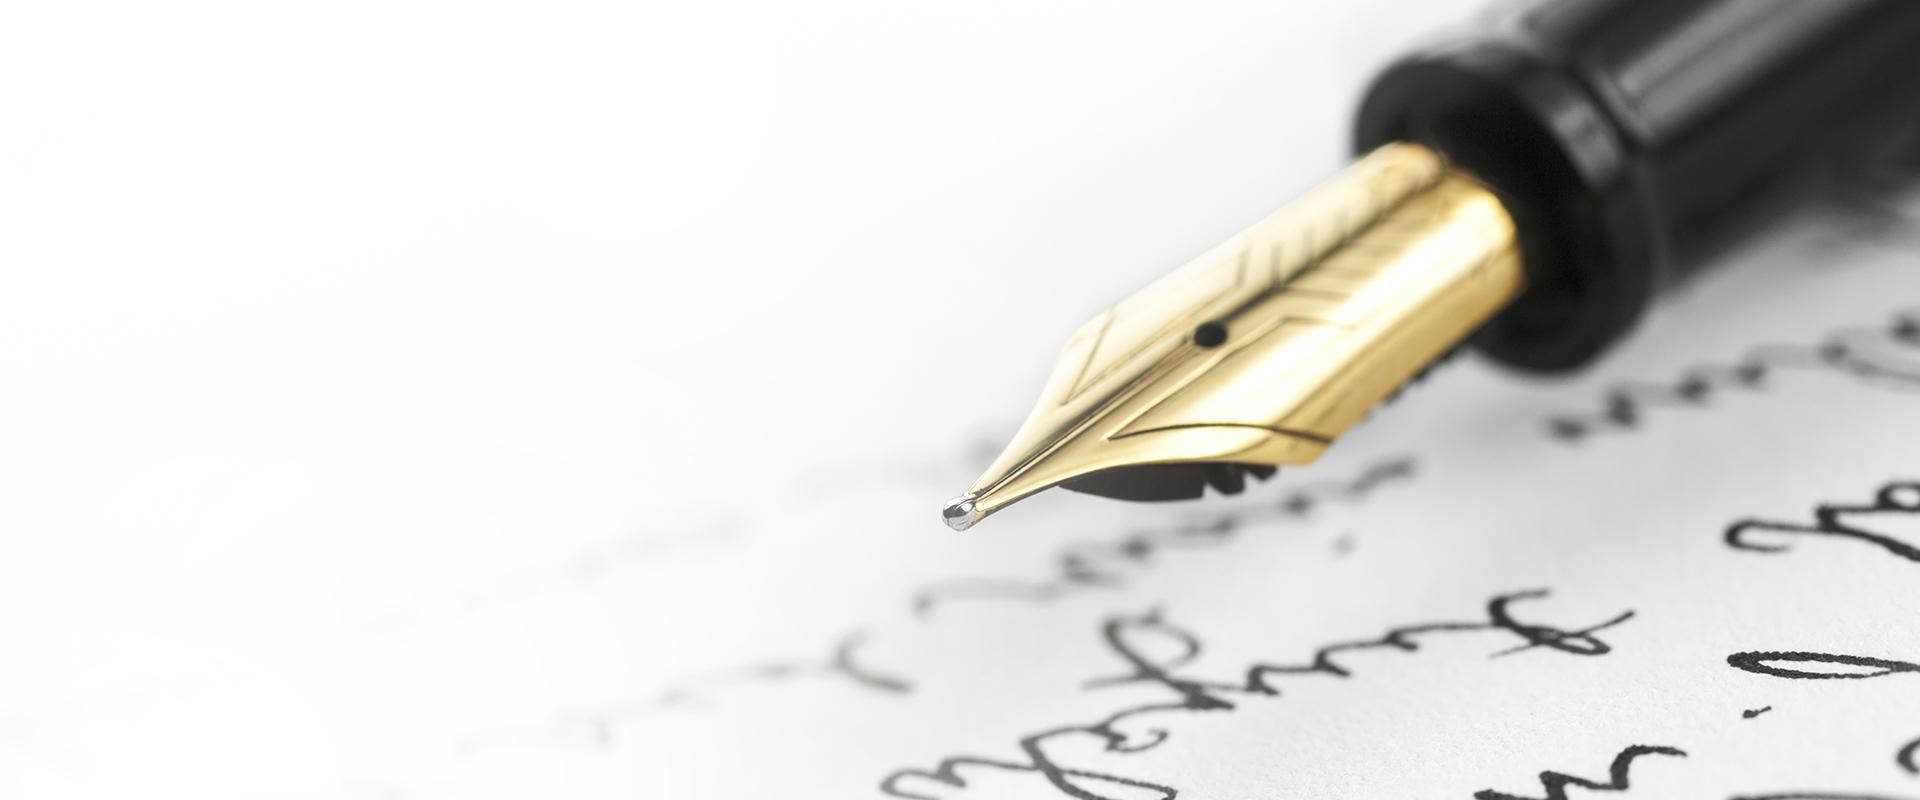 Handwriting-Analysis-Workshop-UAE-Graphology